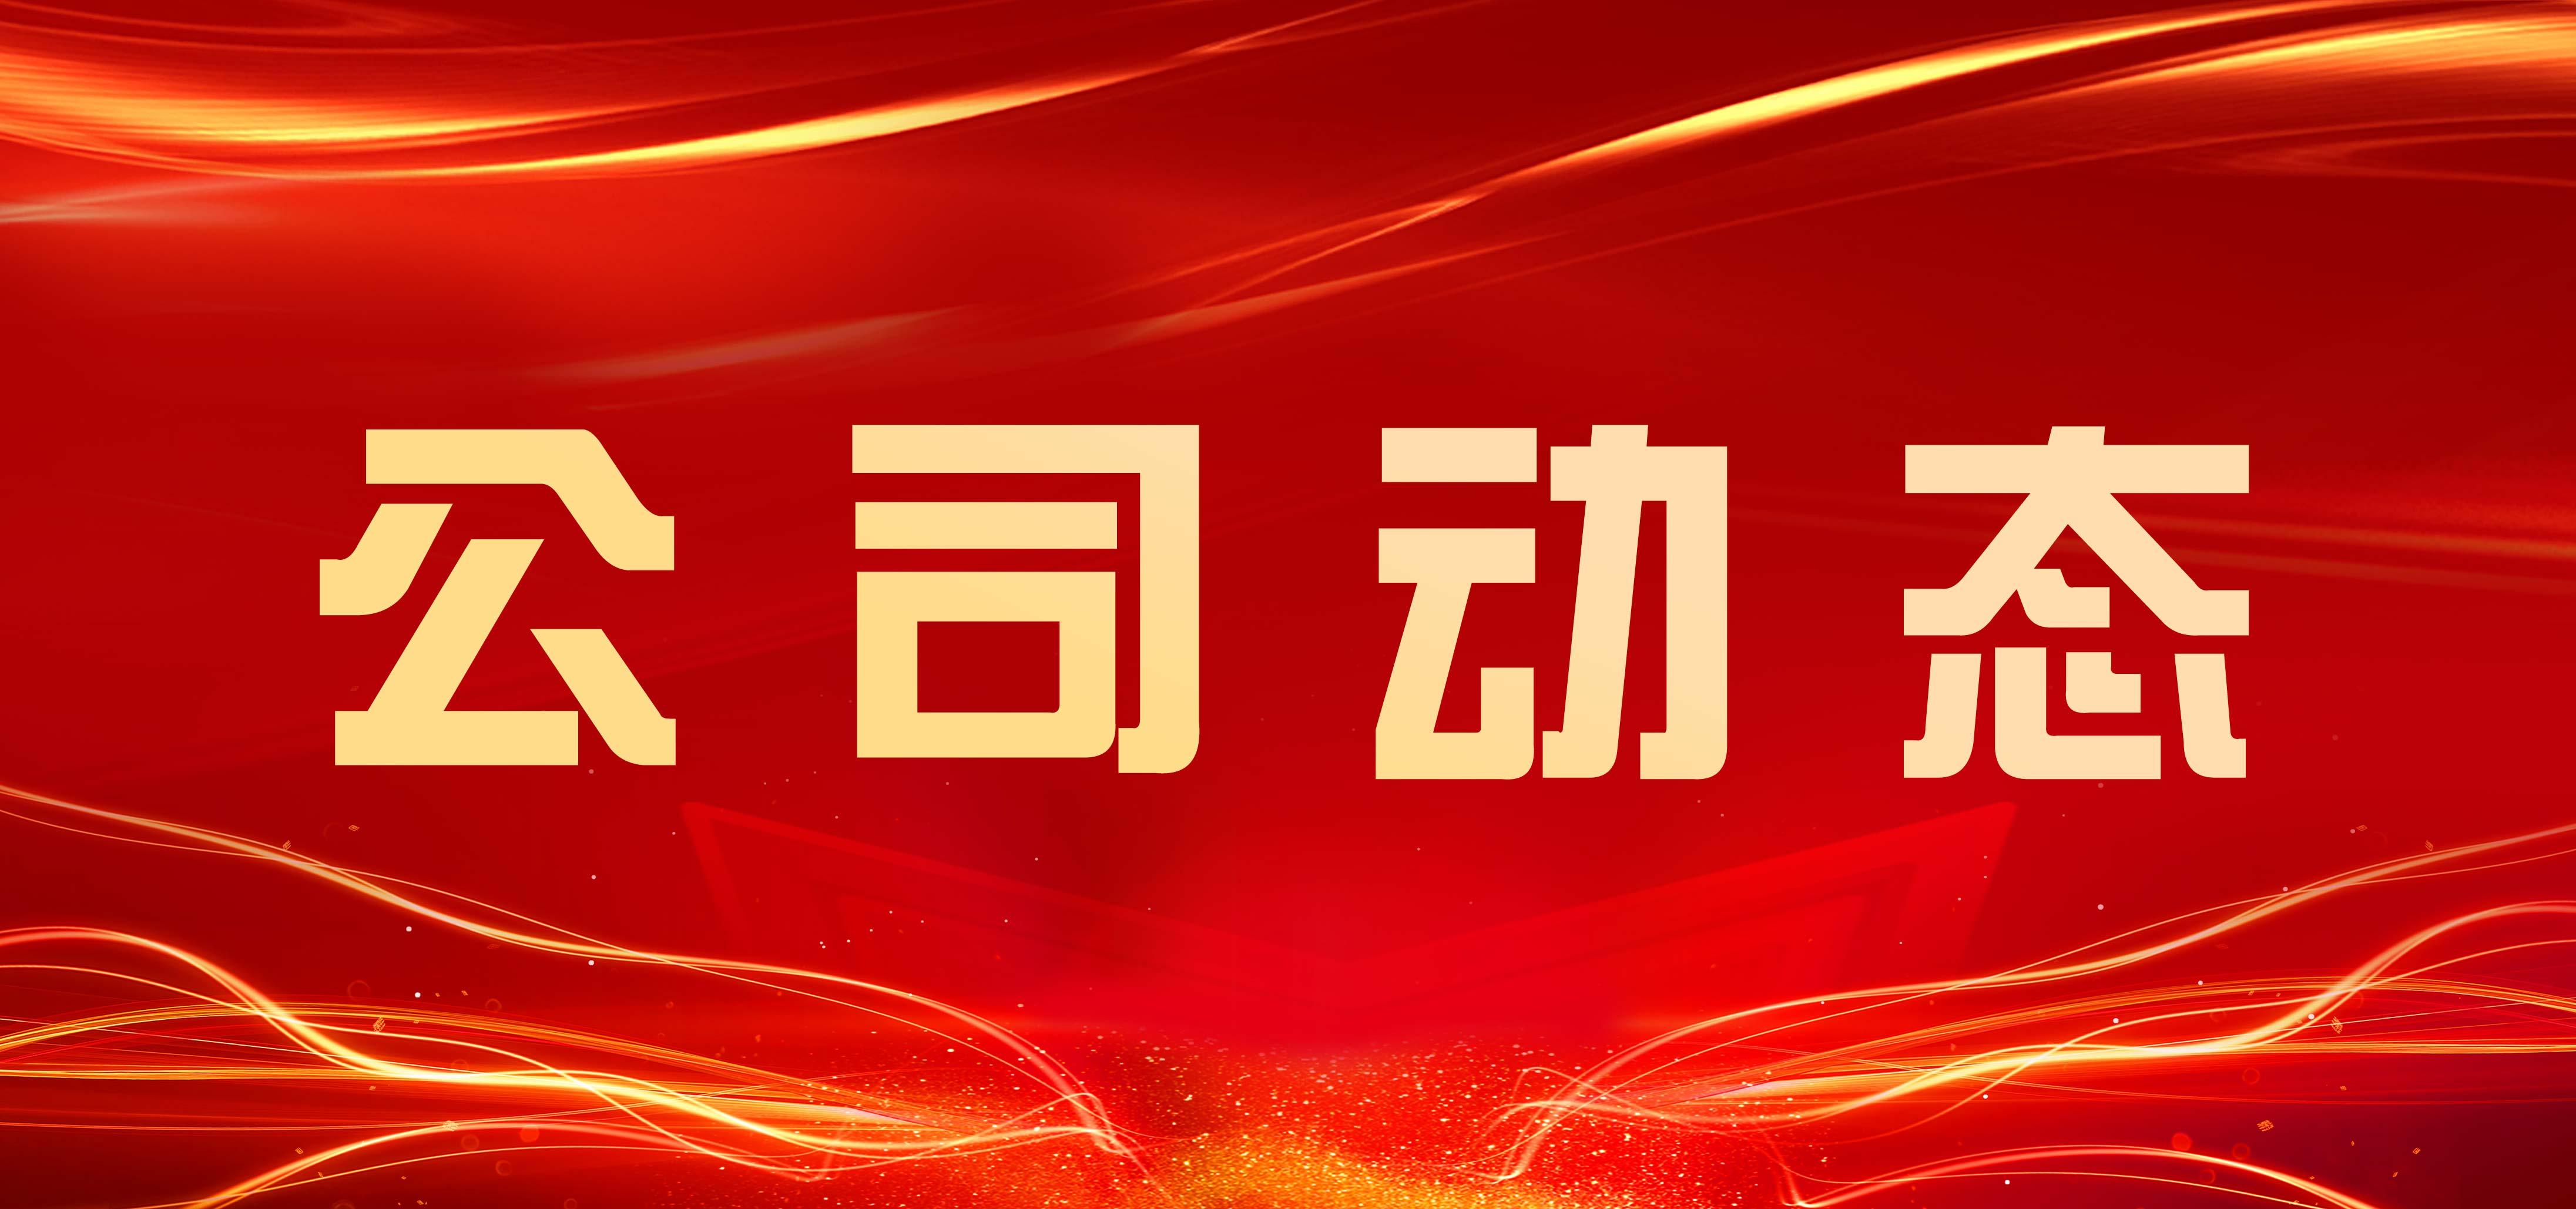 https://timcloud.oss-cn-shanghai.aliyuncs.com/file/iot4/picture/2021/7/12/1626081378647.jpg